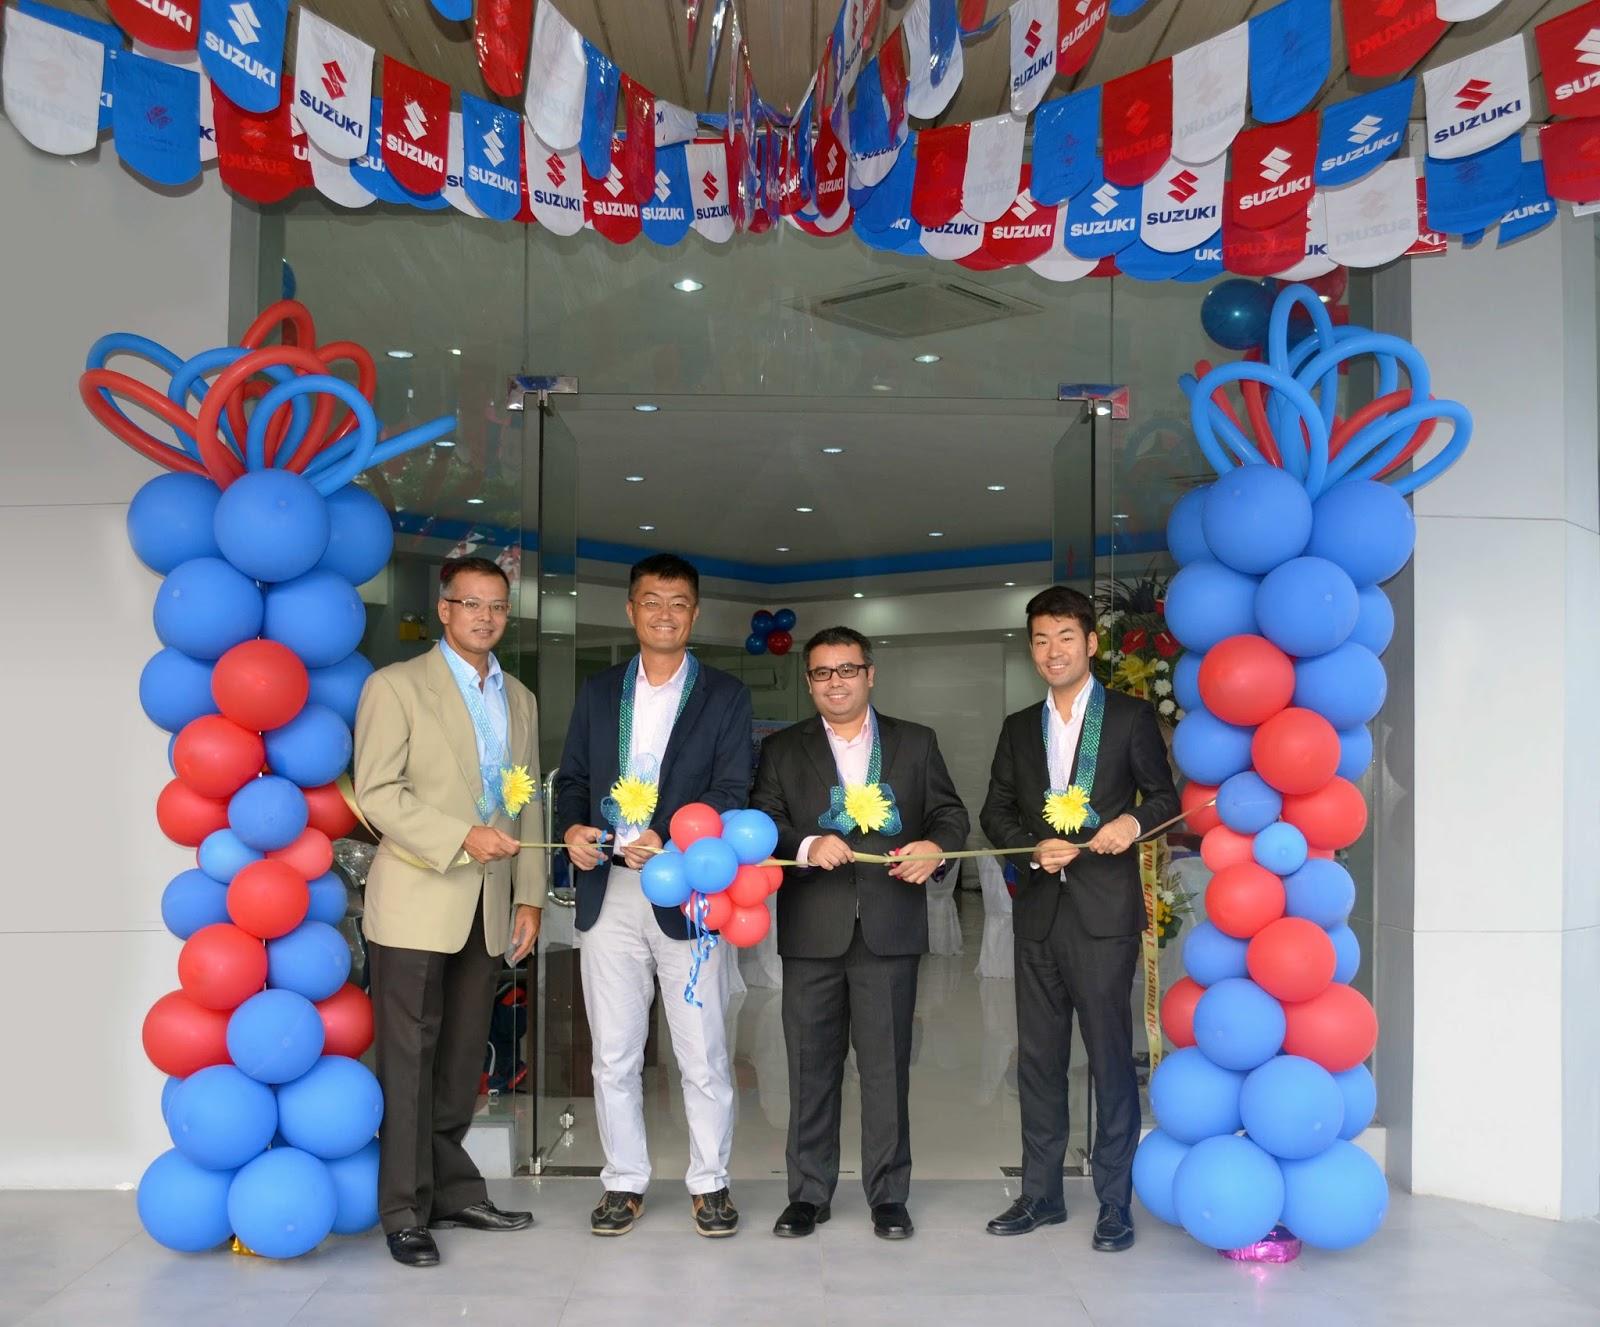 Naga and Legaspi Opening